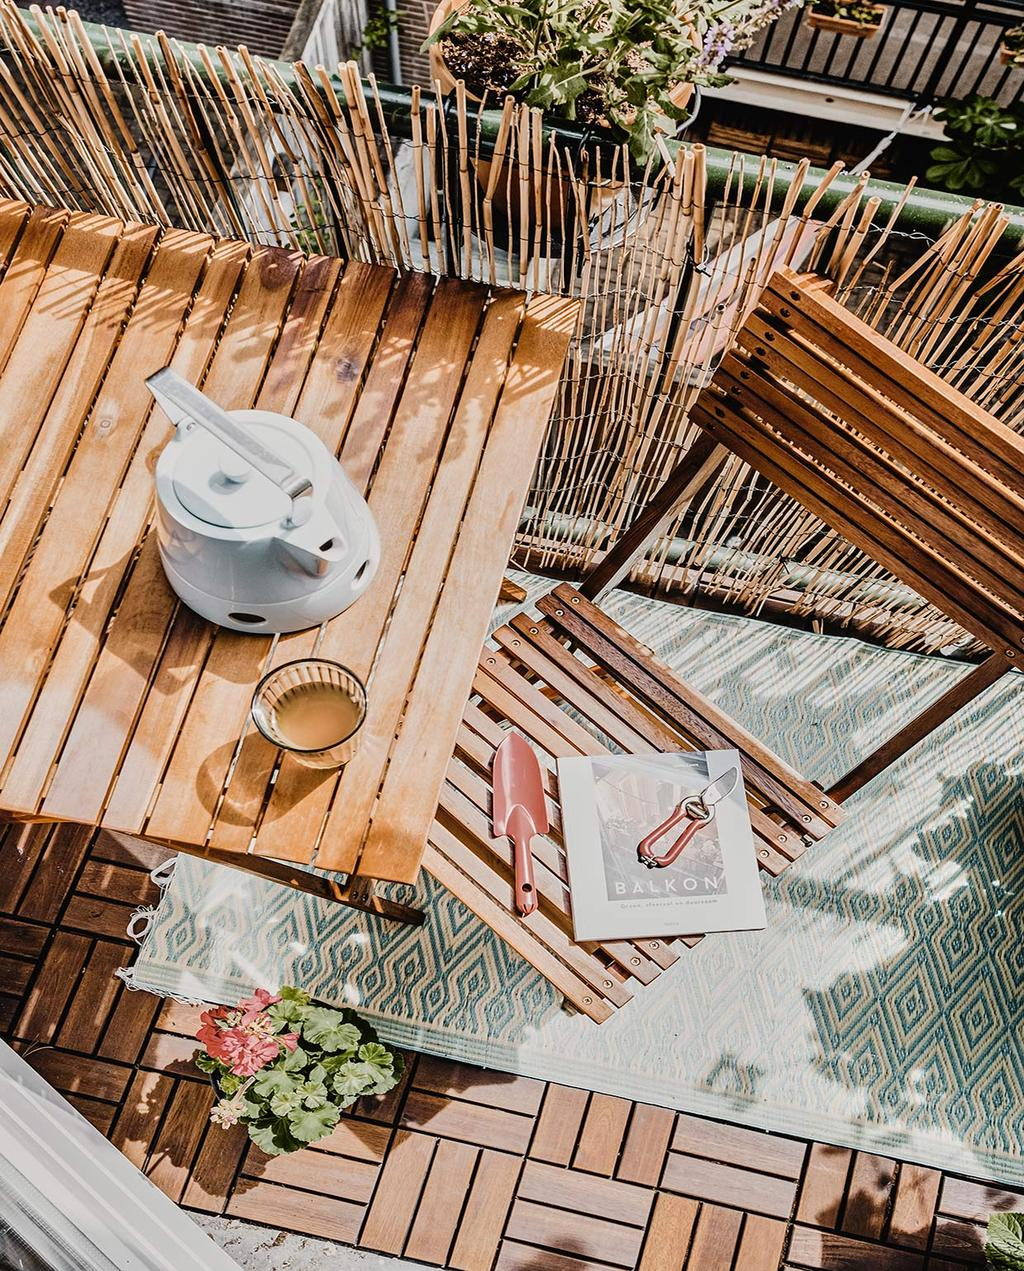 vtwonen 02-2021 | tafel en stoel op zonnig balkon